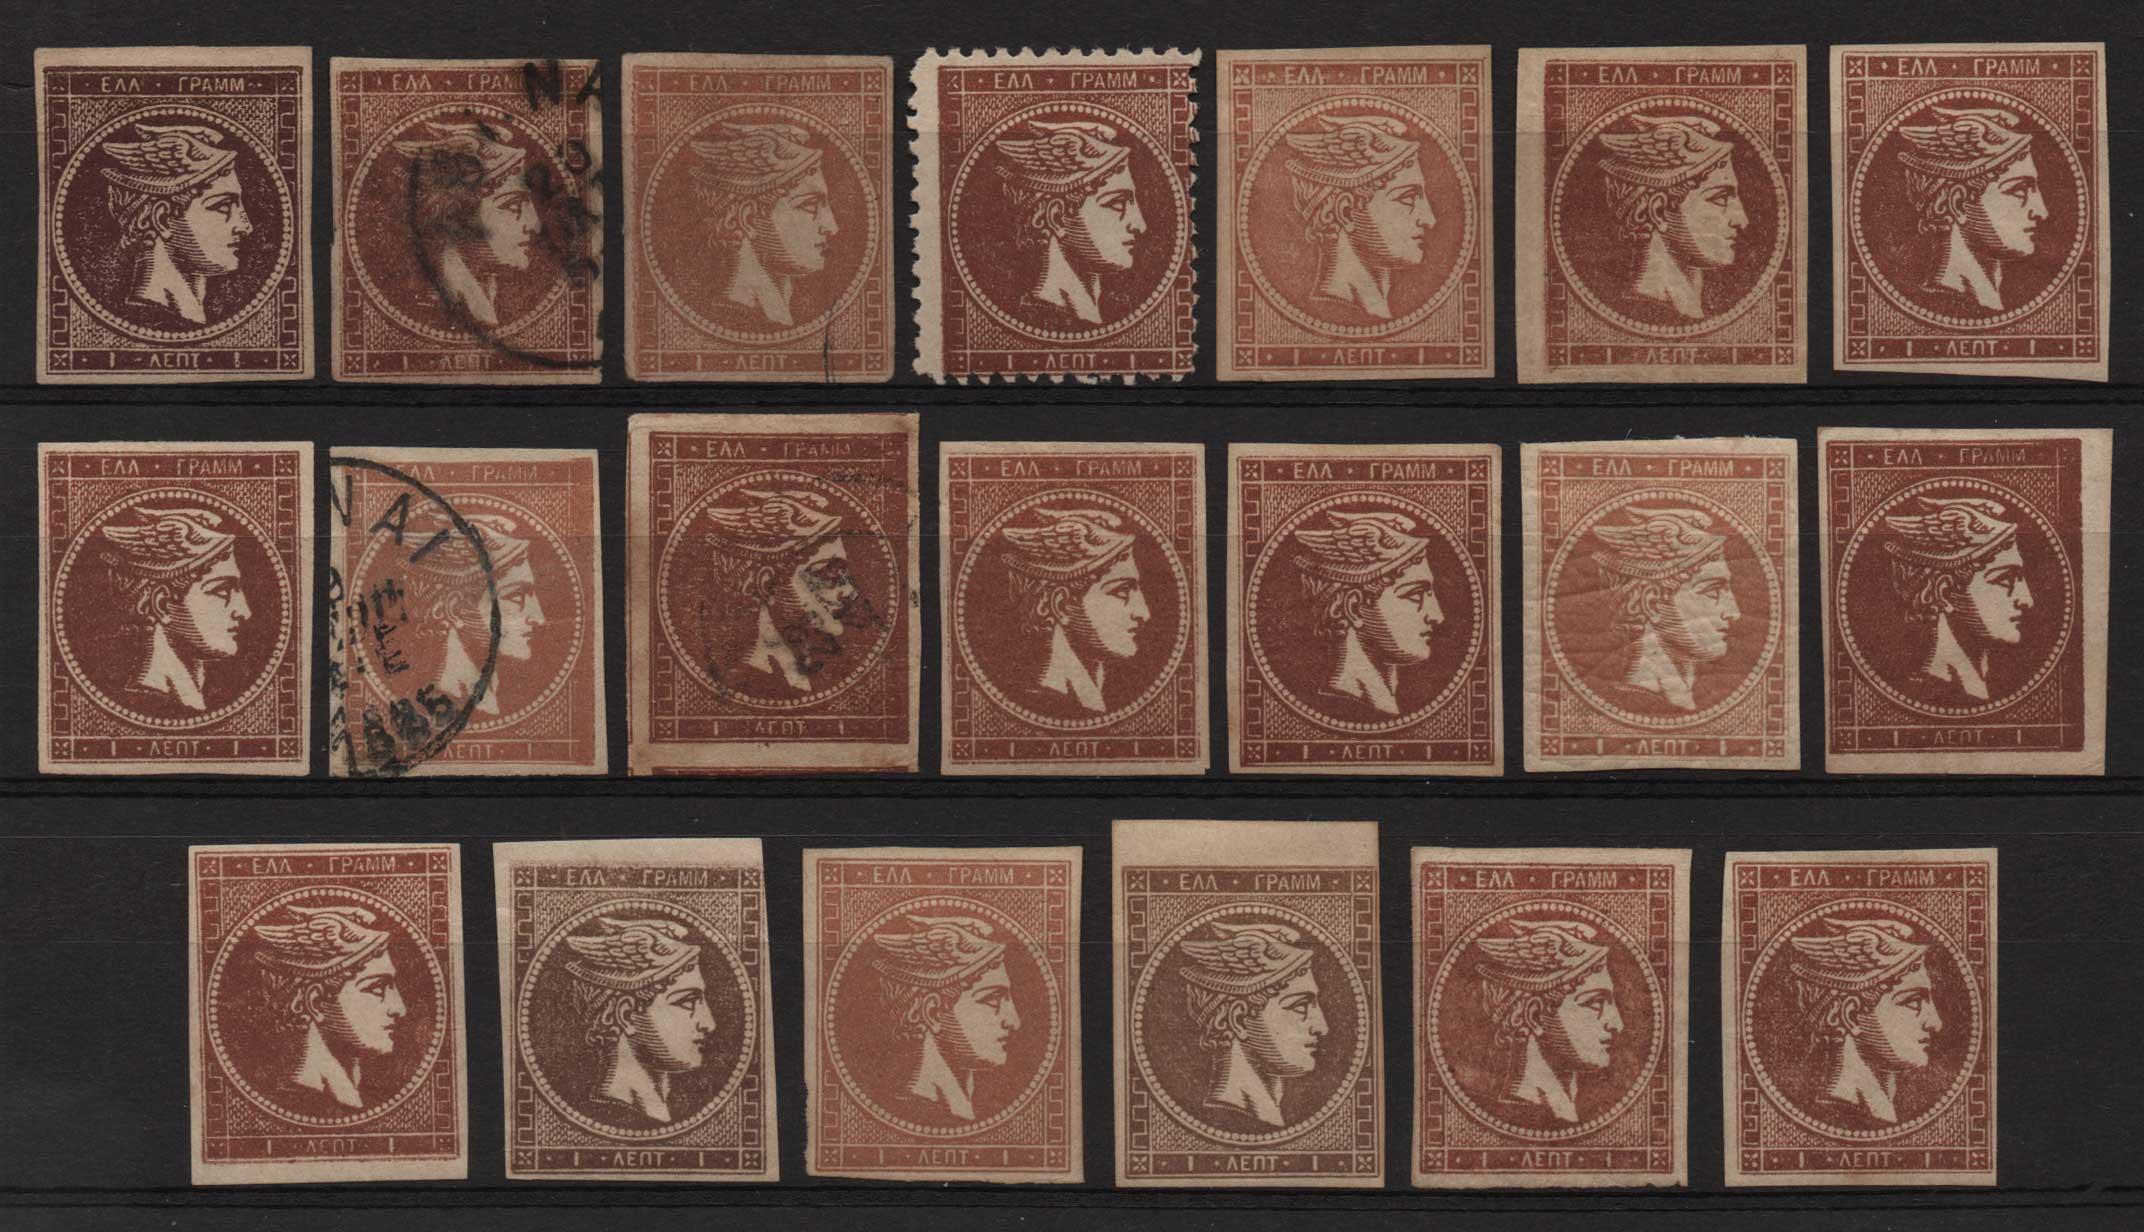 Lot 16 - -  LARGE HERMES HEAD large hermes head -  Athens Auctions Public Auction 70 General Stamp Sale